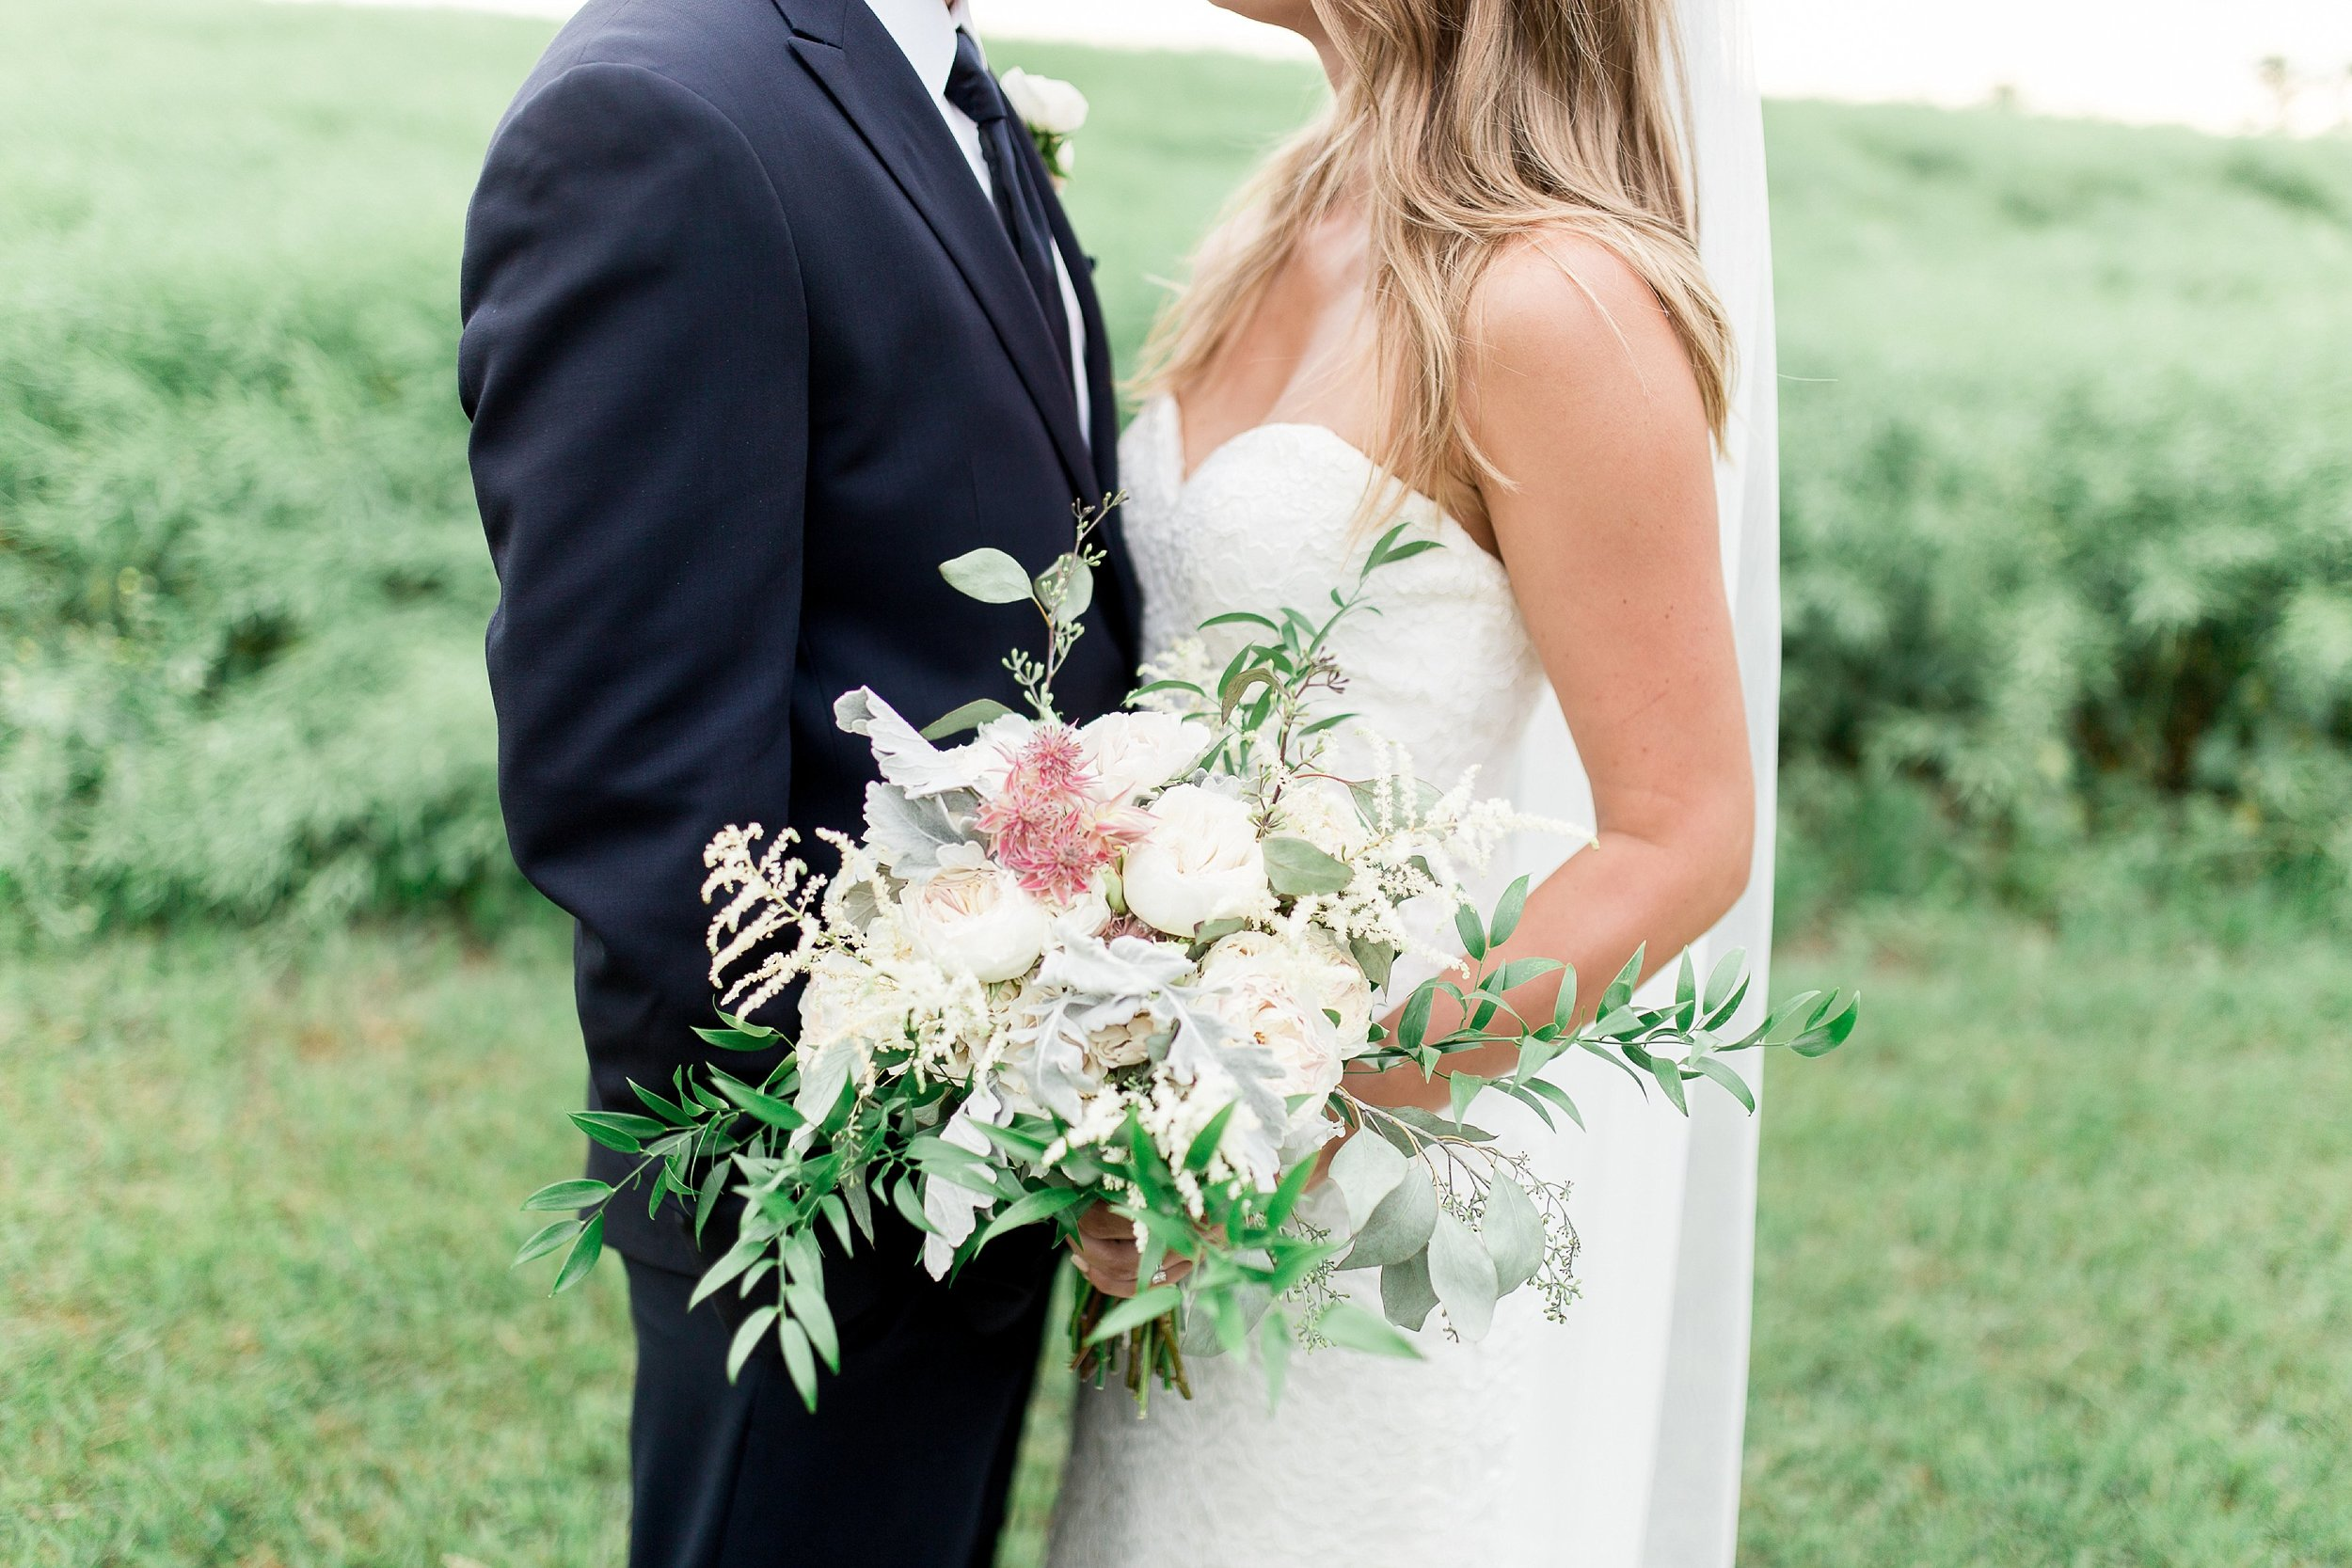 Vancouver wedding photographer   Keila Marie Photography   Bride and groom portraits  Garden inspired wedding